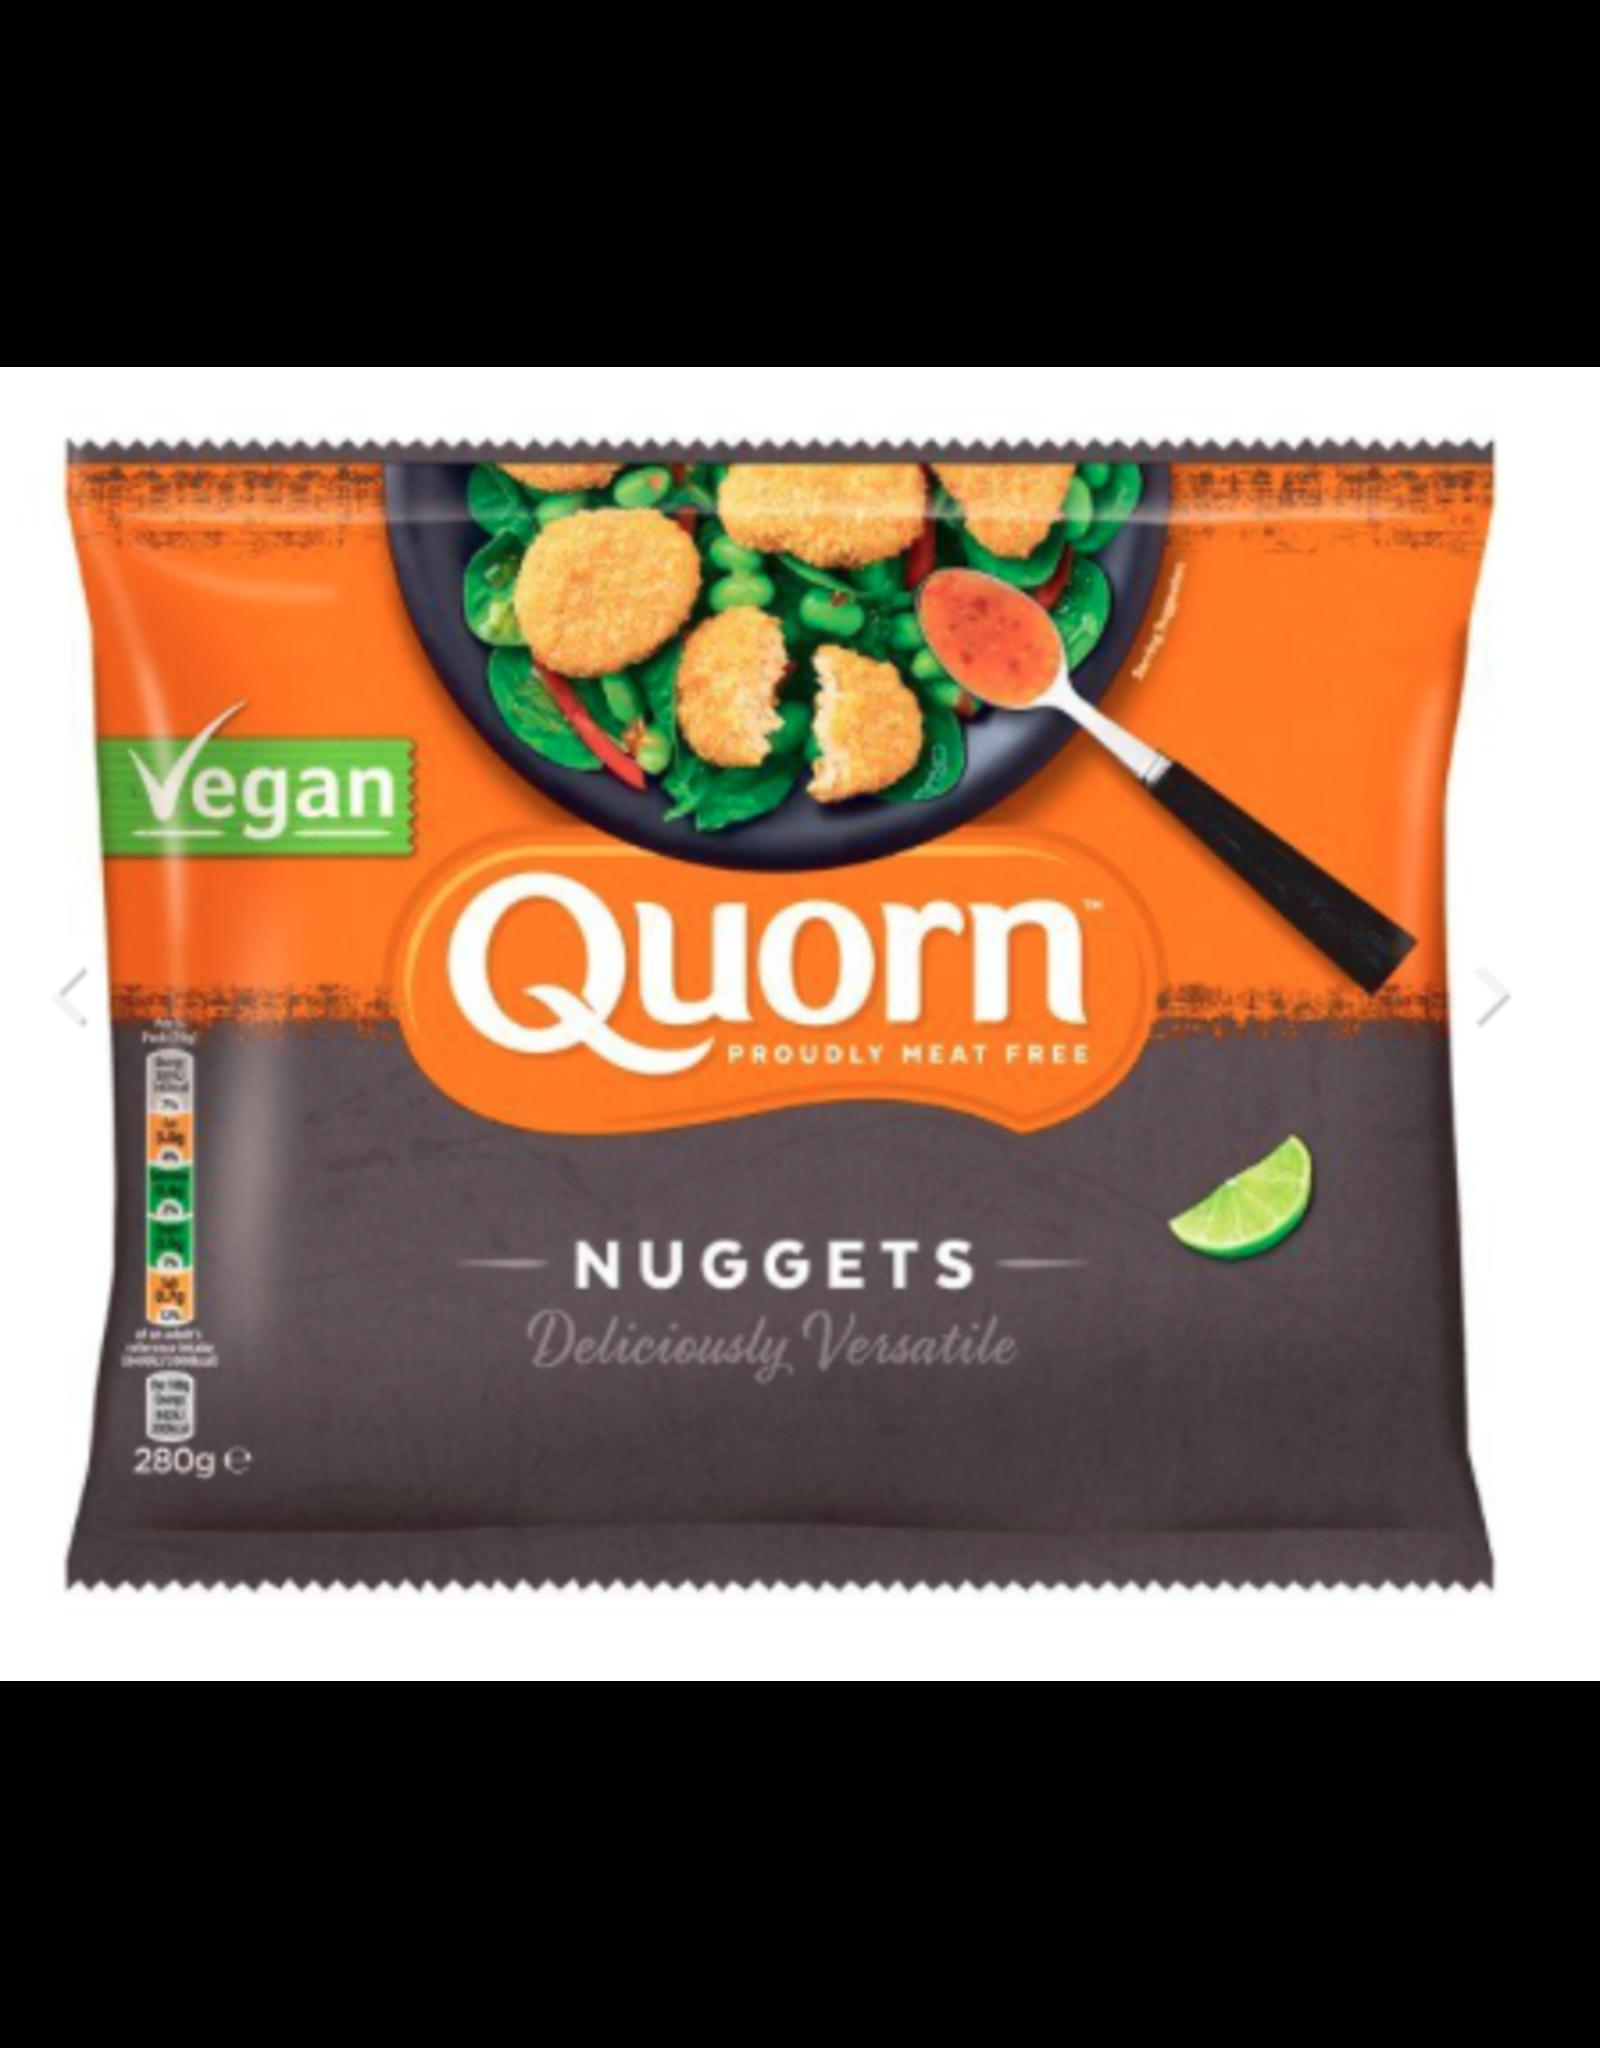 Quorn Vegane Nuggets, 280g  ❄️❄️❄️